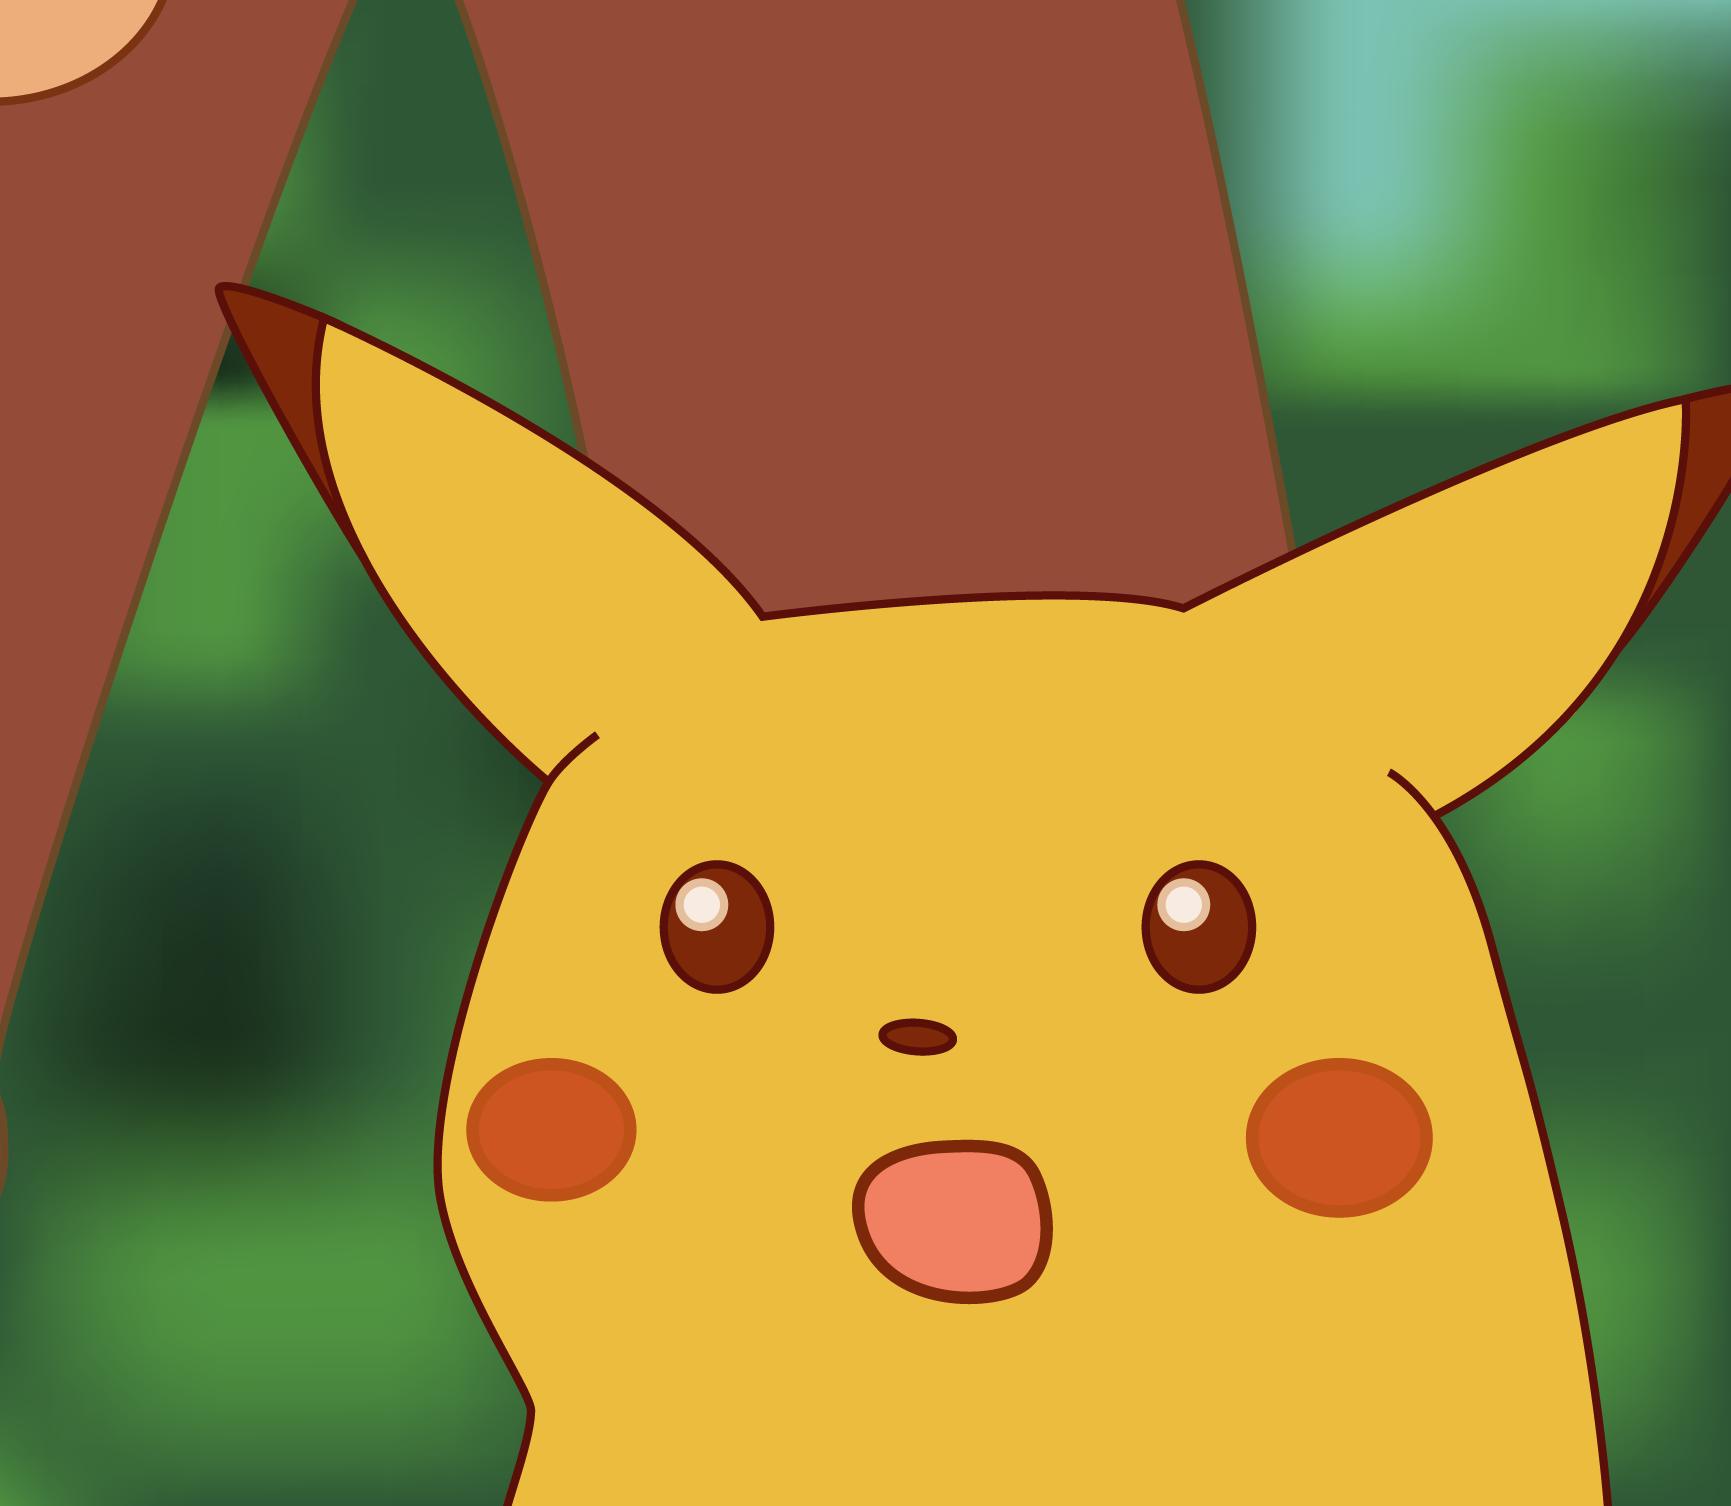 Hd Version Surprised Pikachu Know Your Meme